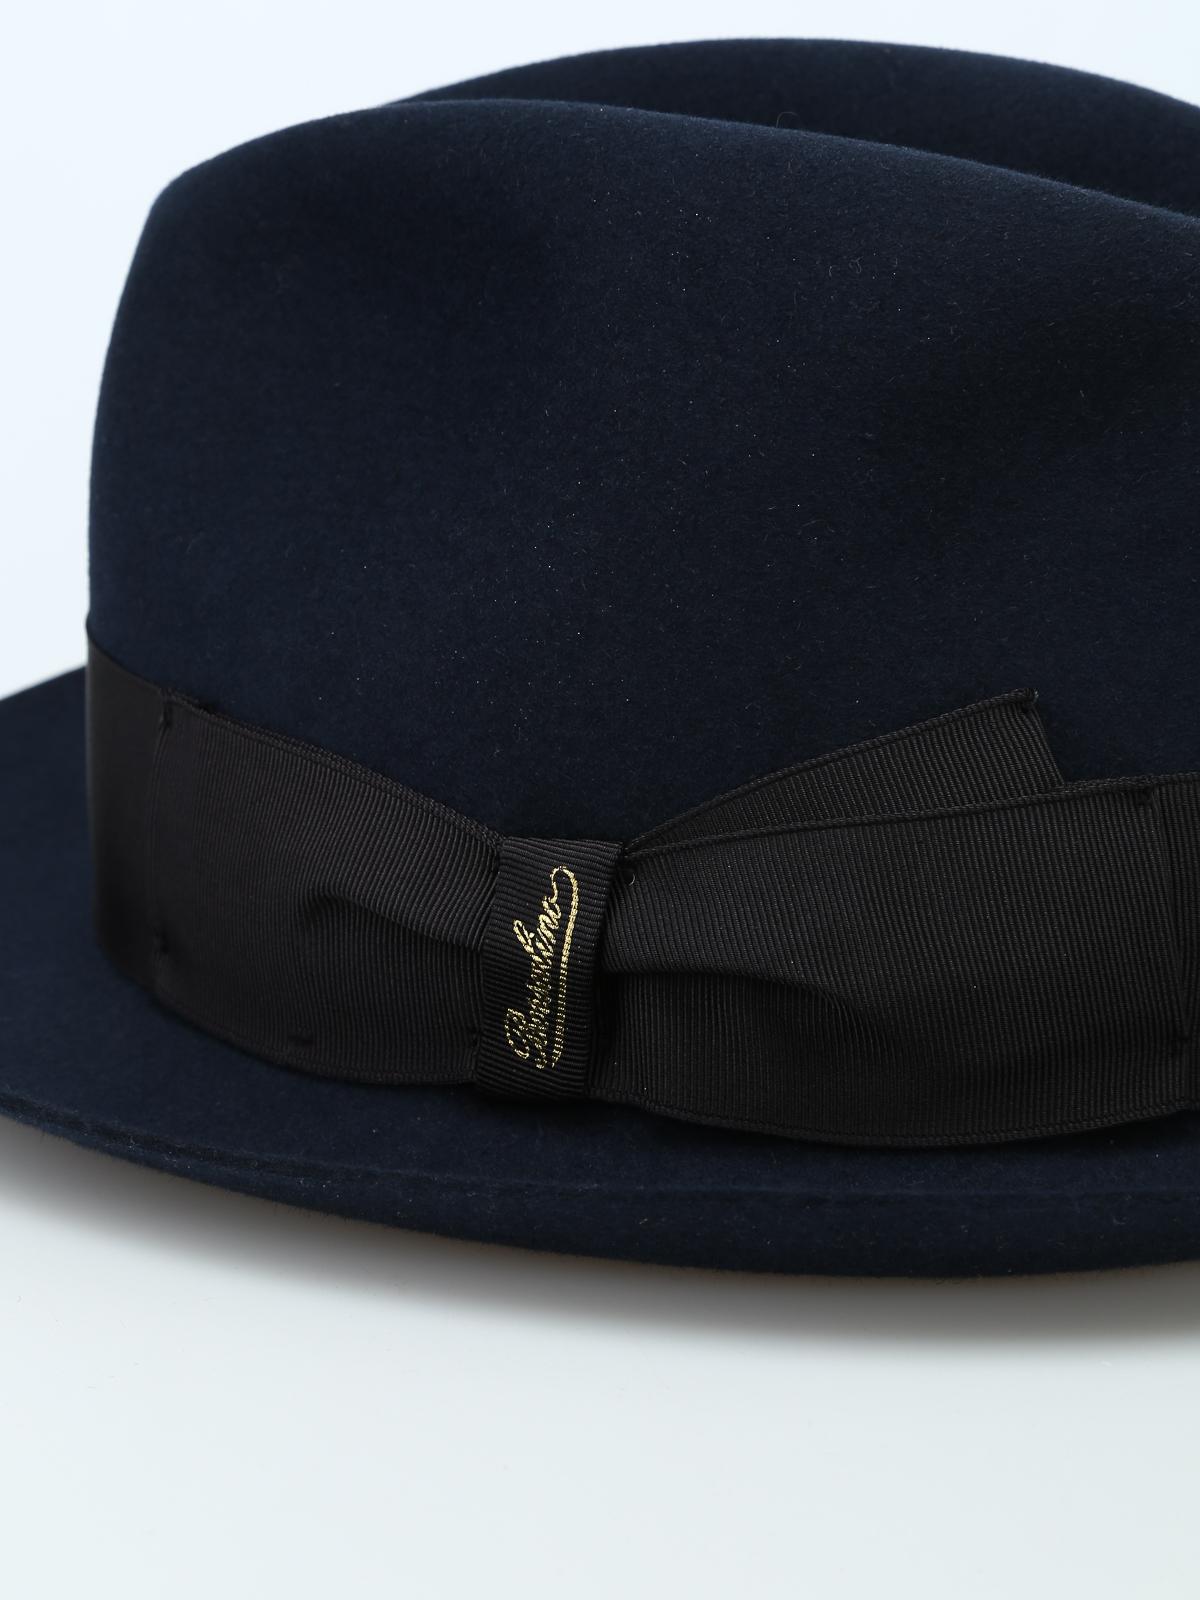 iKRIX BORSALINO  hats   caps - Alessandria grosgrain band blue felt hat 9aa32197457